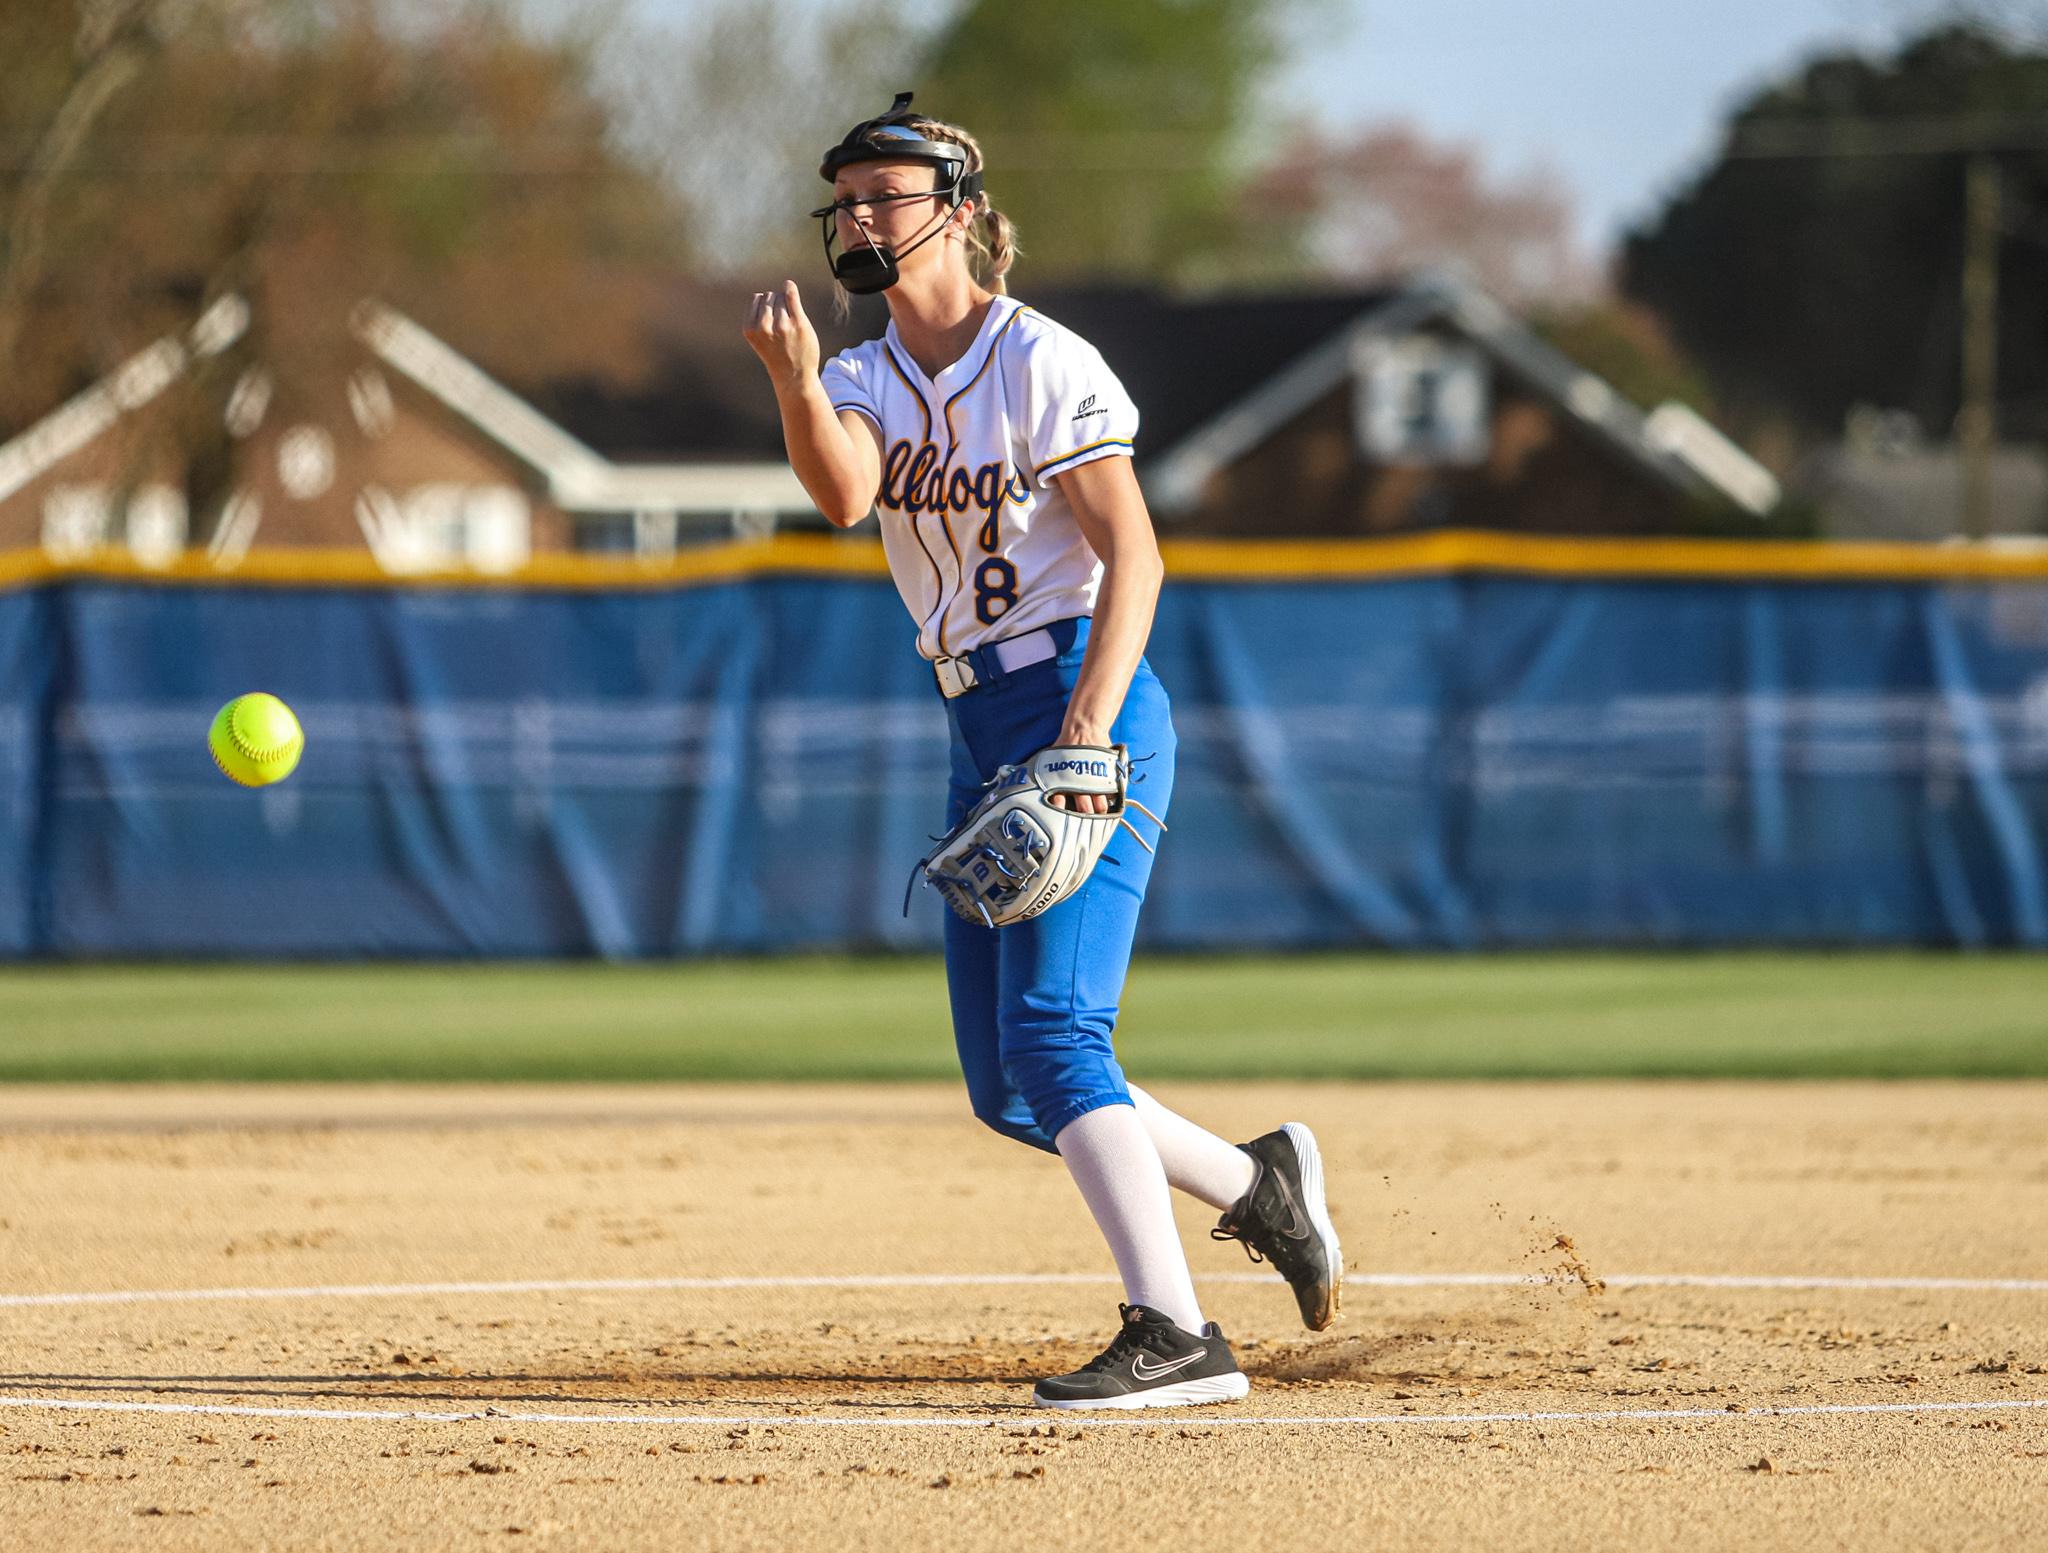 Athletes Of The Week: Gracelyn Massey